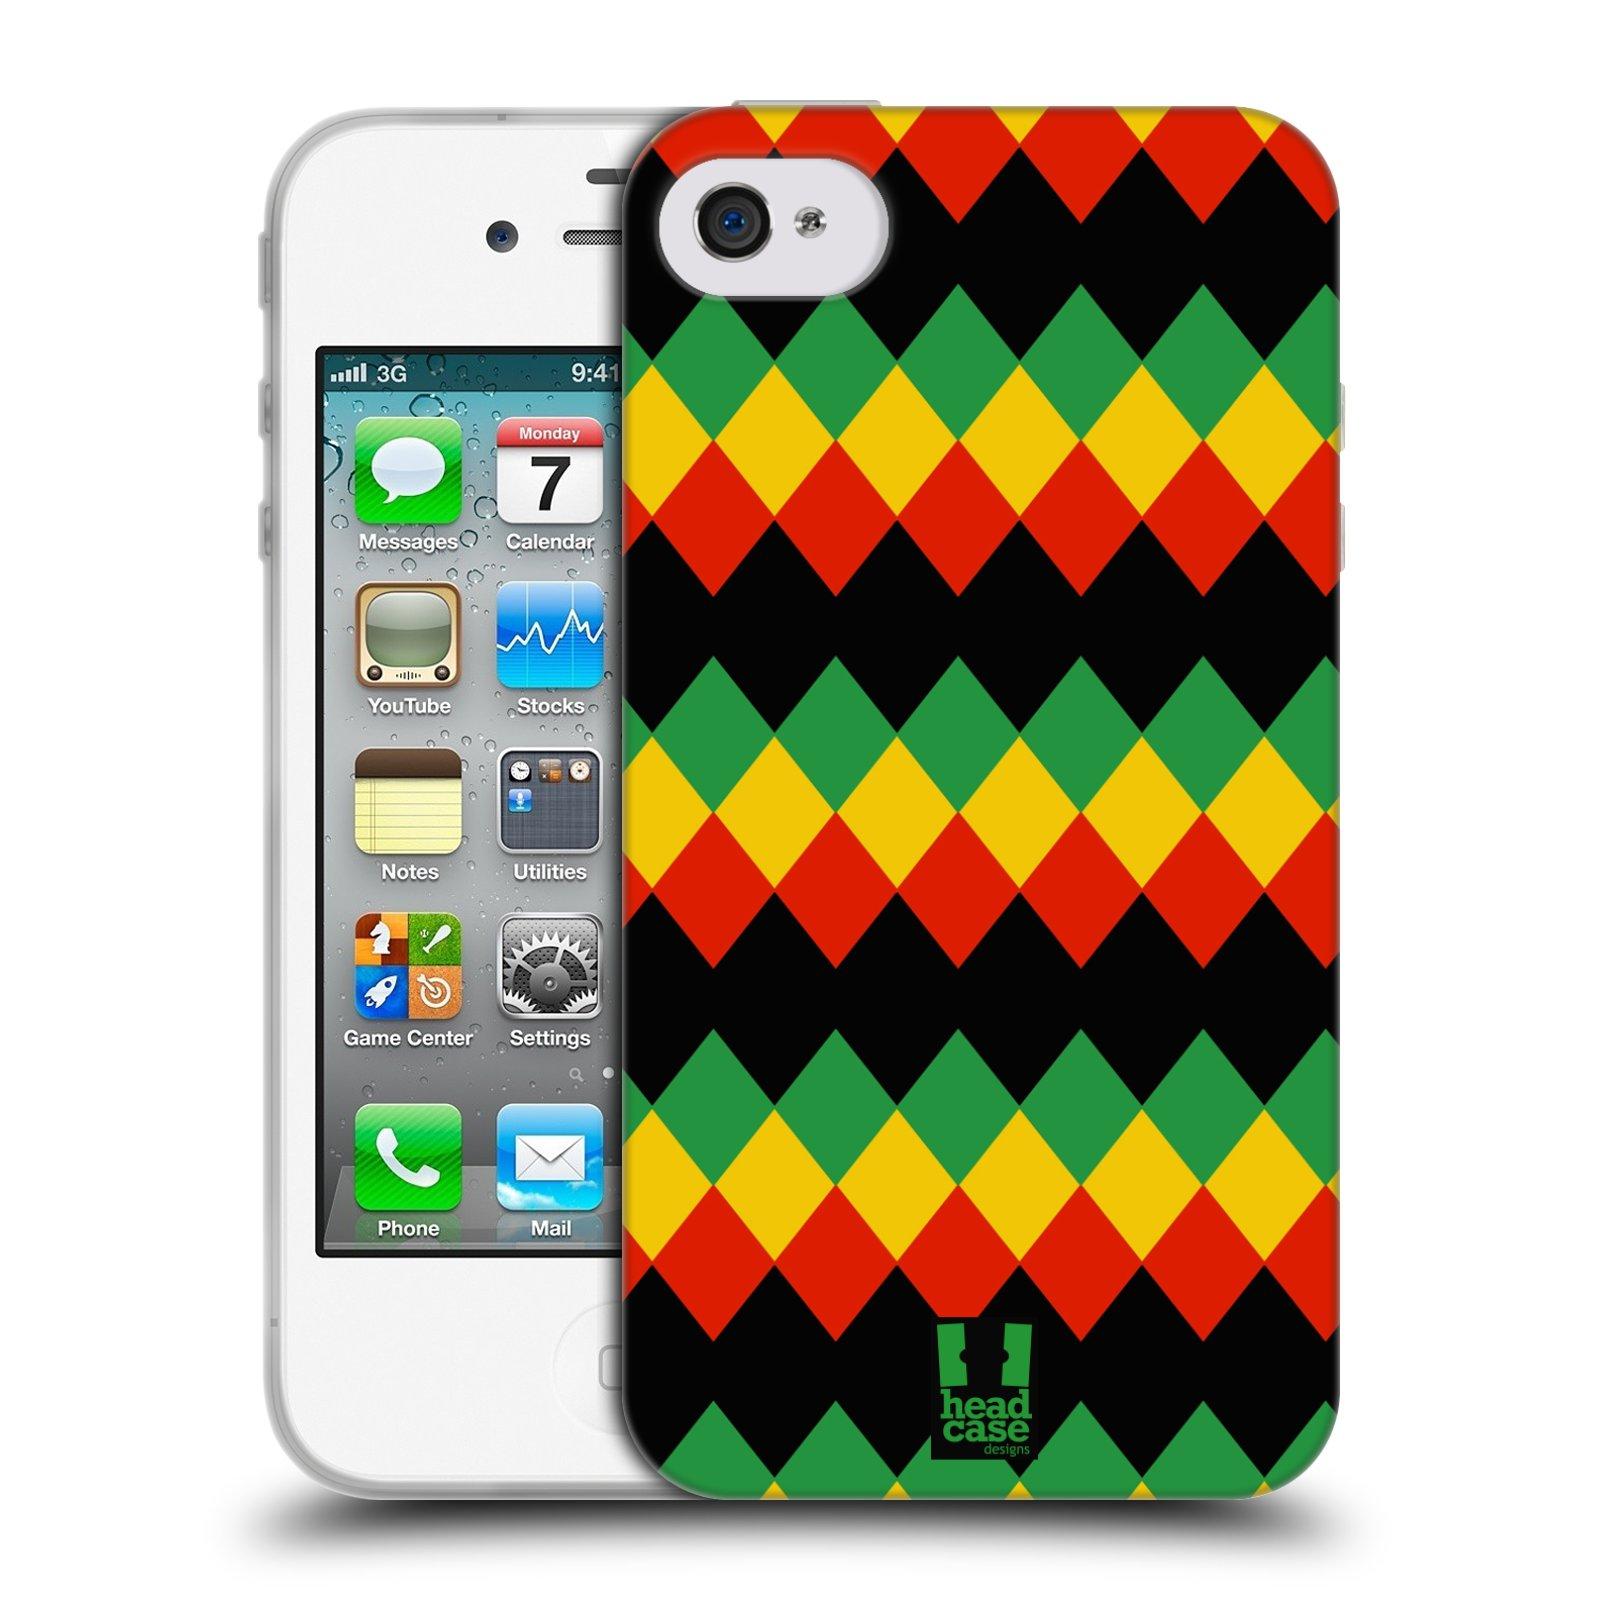 HEAD CASE silikonový obal na mobil Apple Iphone 4/4S vzor Rasta barevné vzory DIAMANT